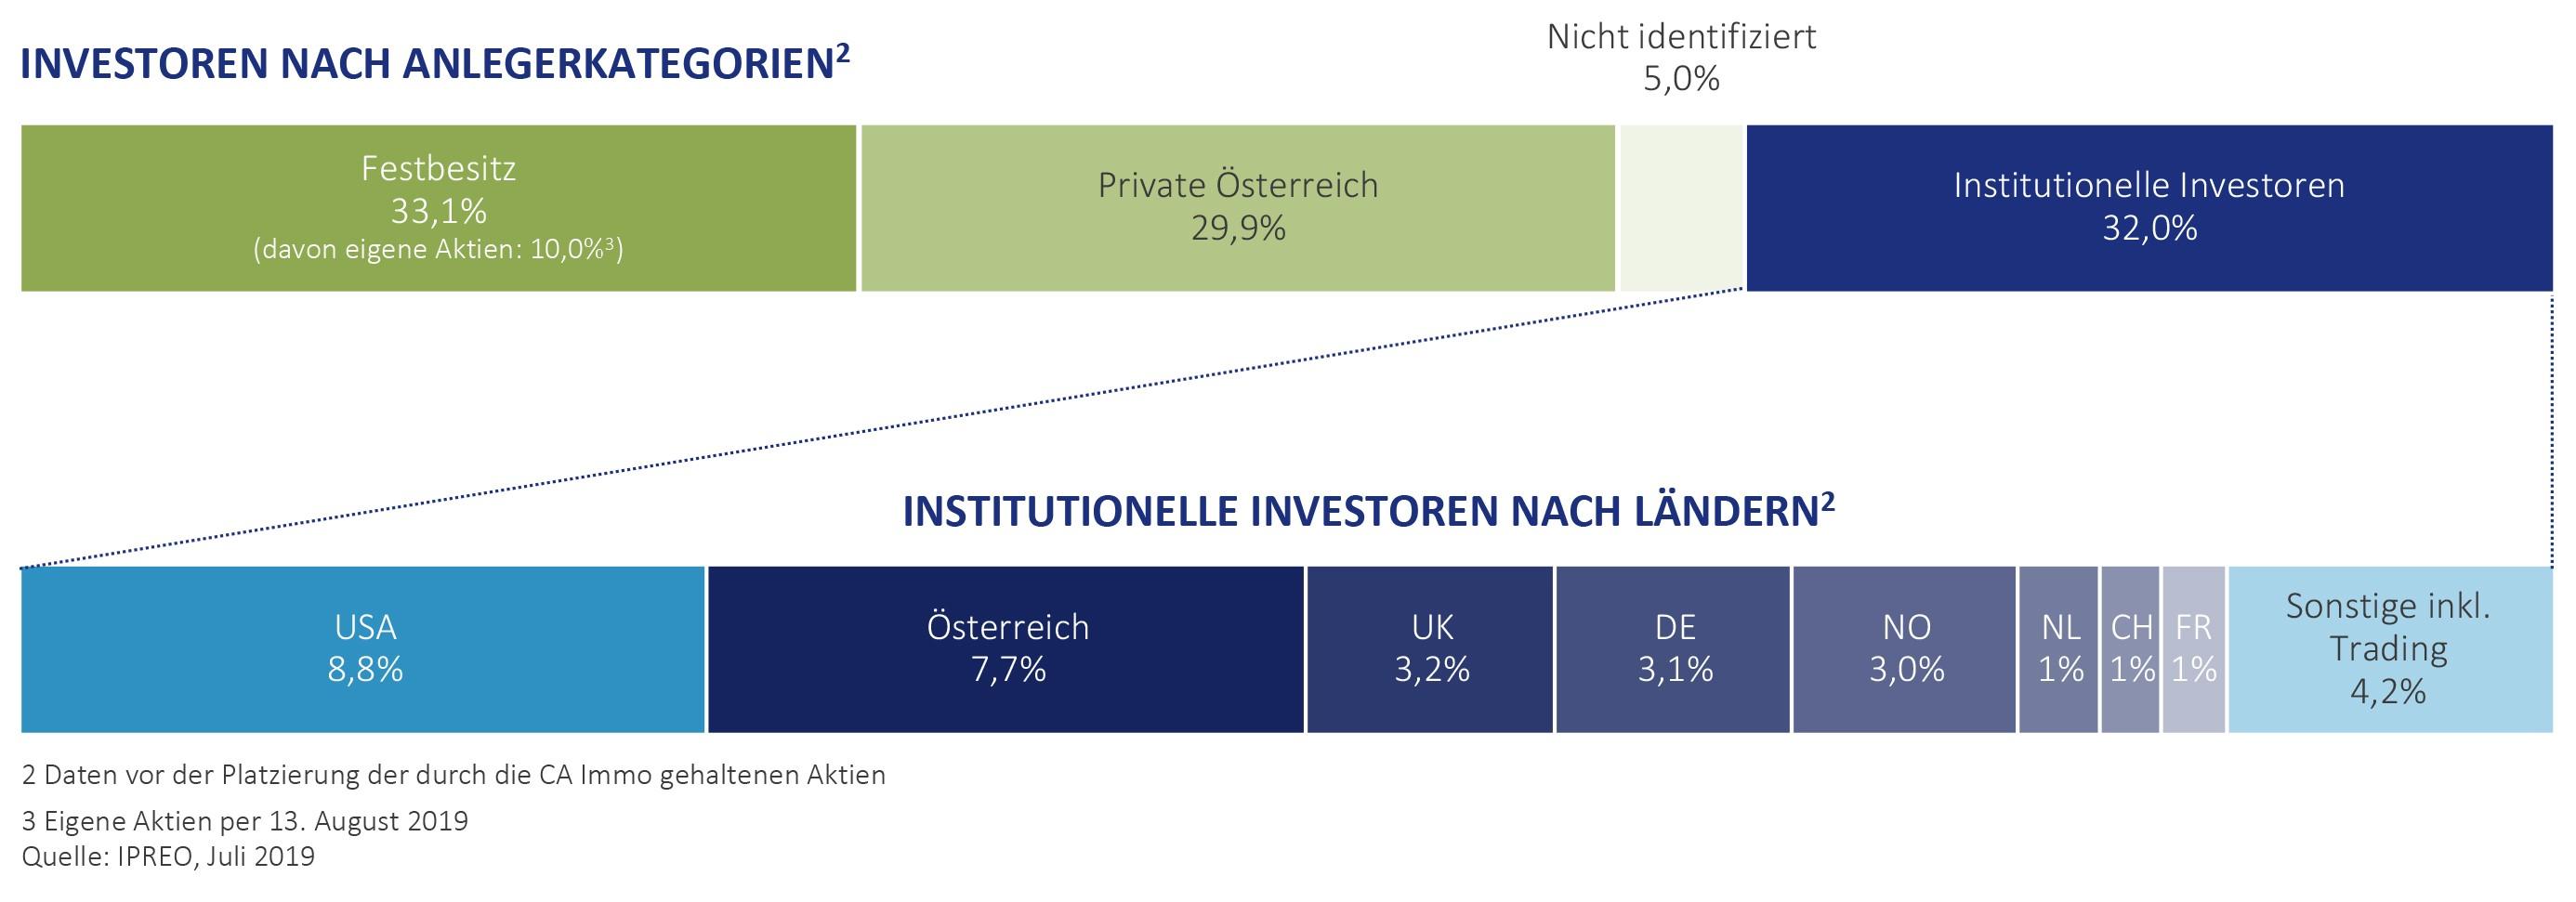 Aktionärsstruktur - Investoren nach Anlegerkategorien